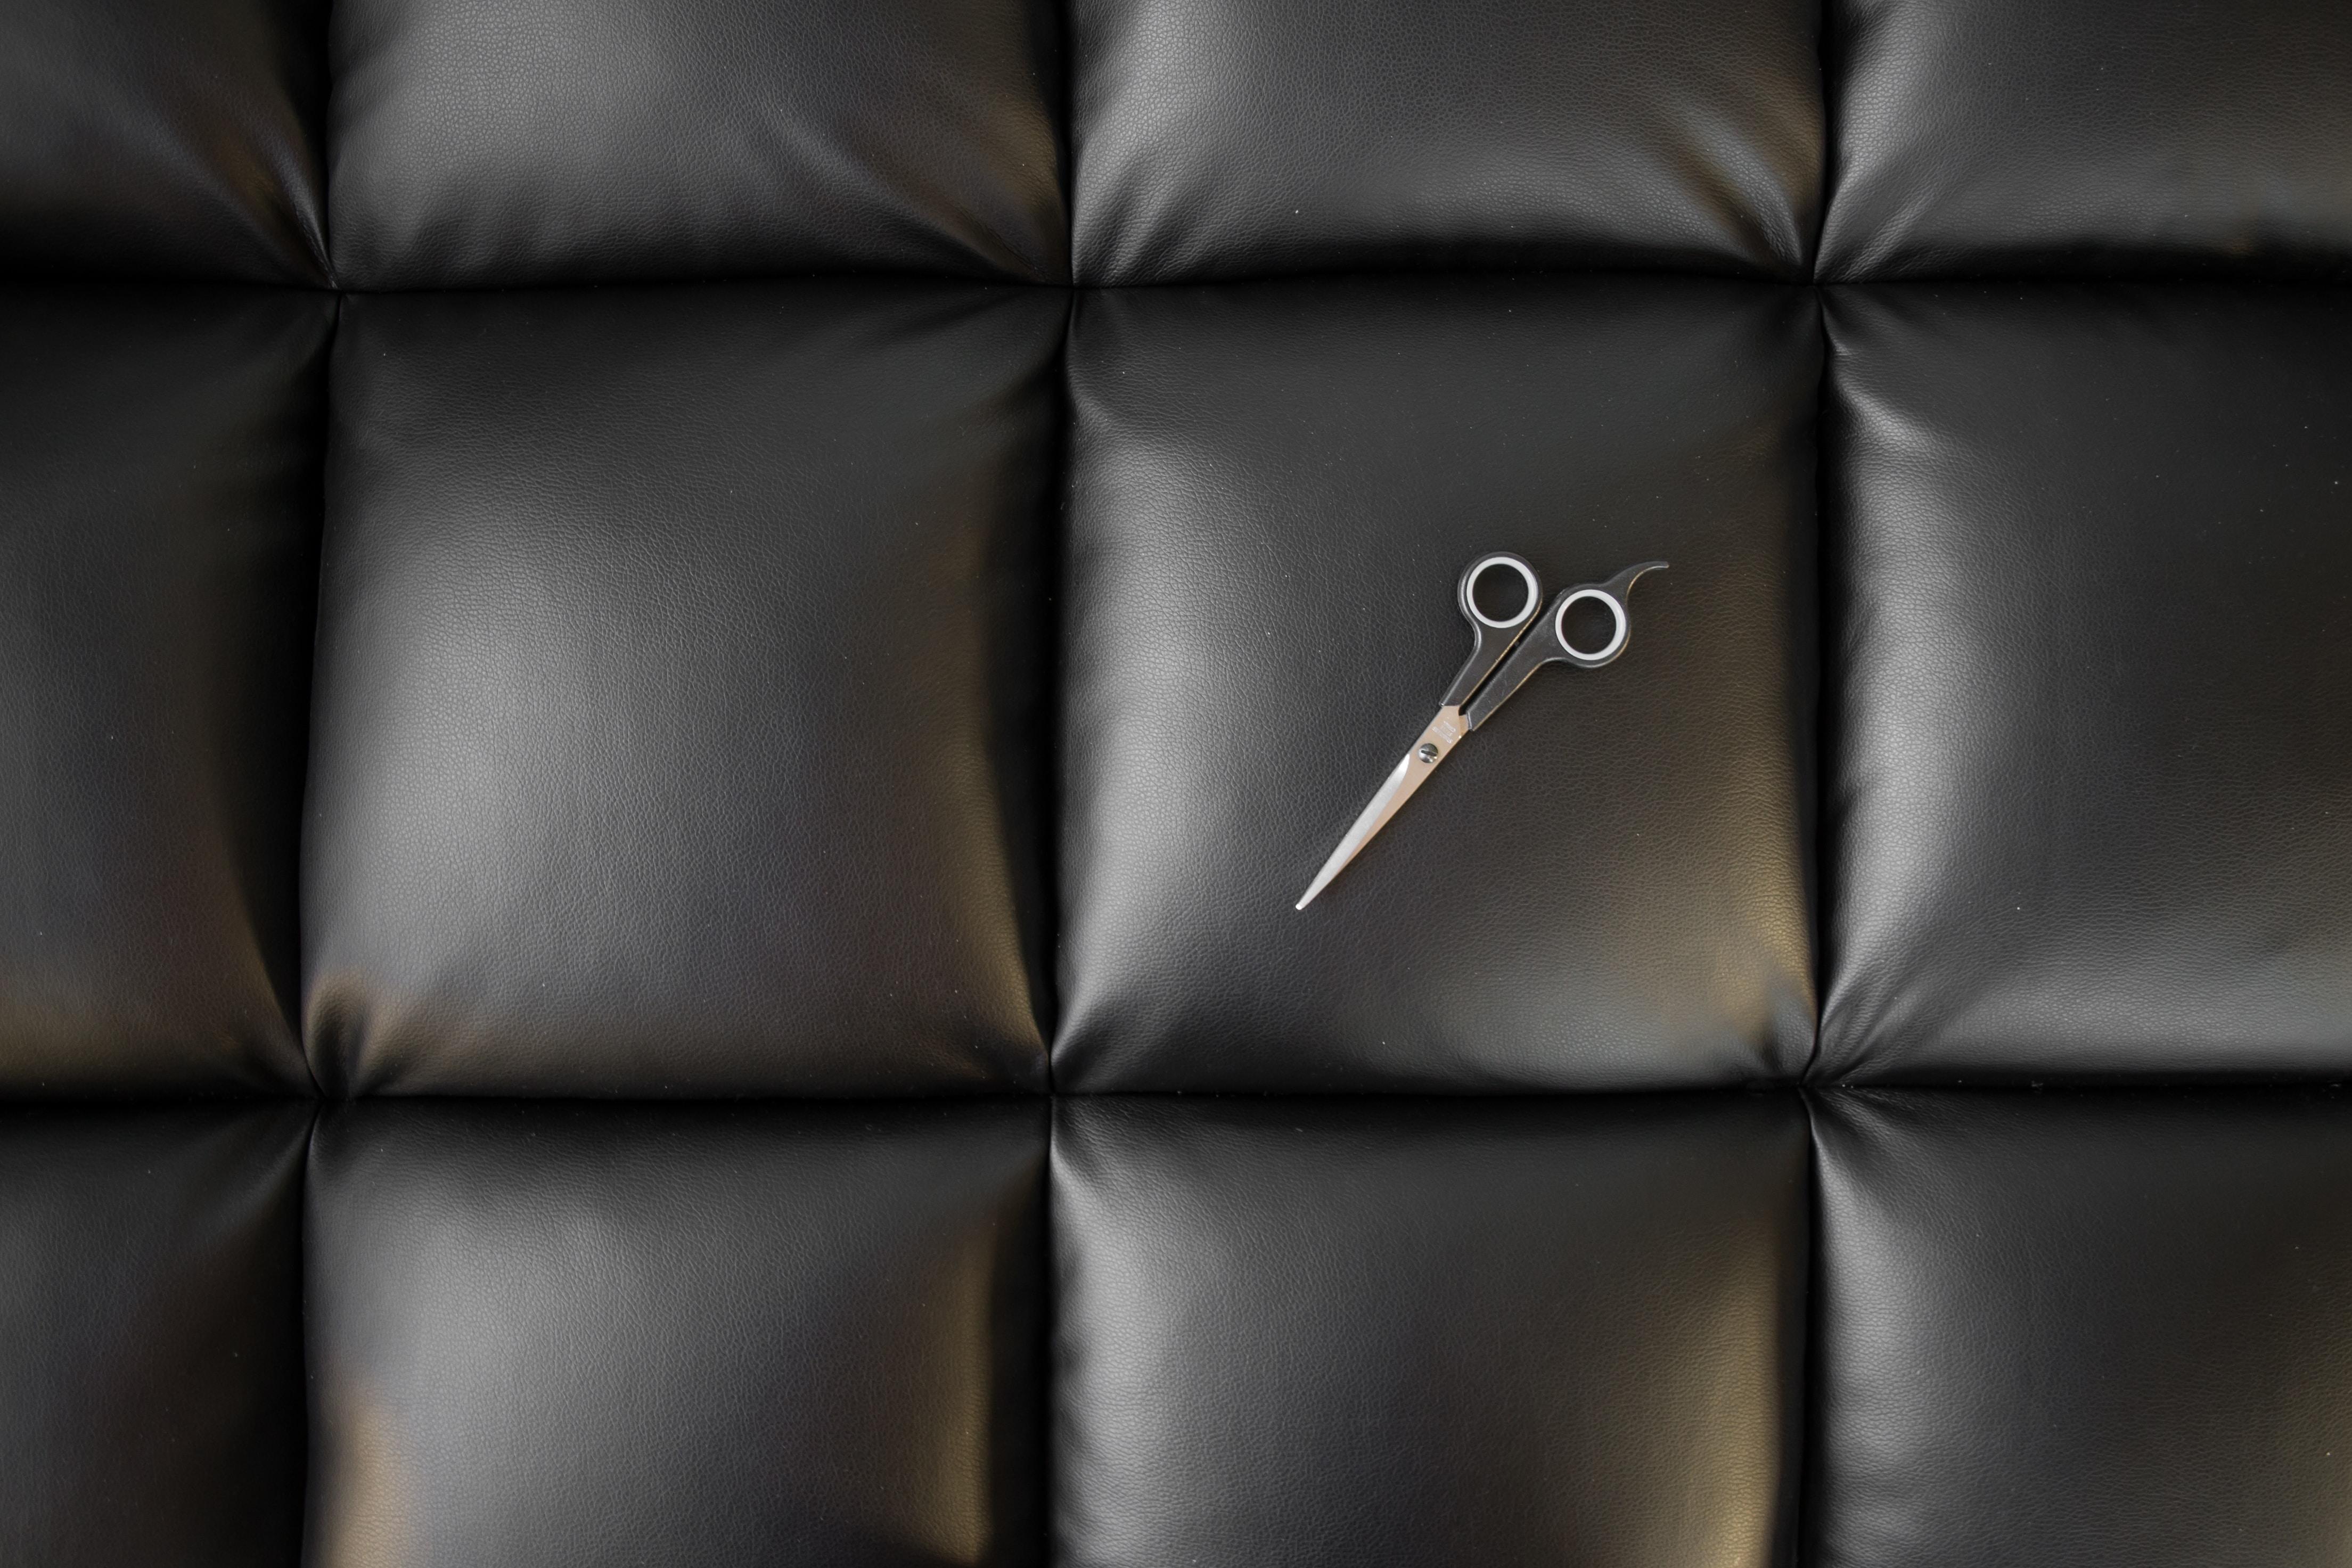 gray metal scissors on black leather pad